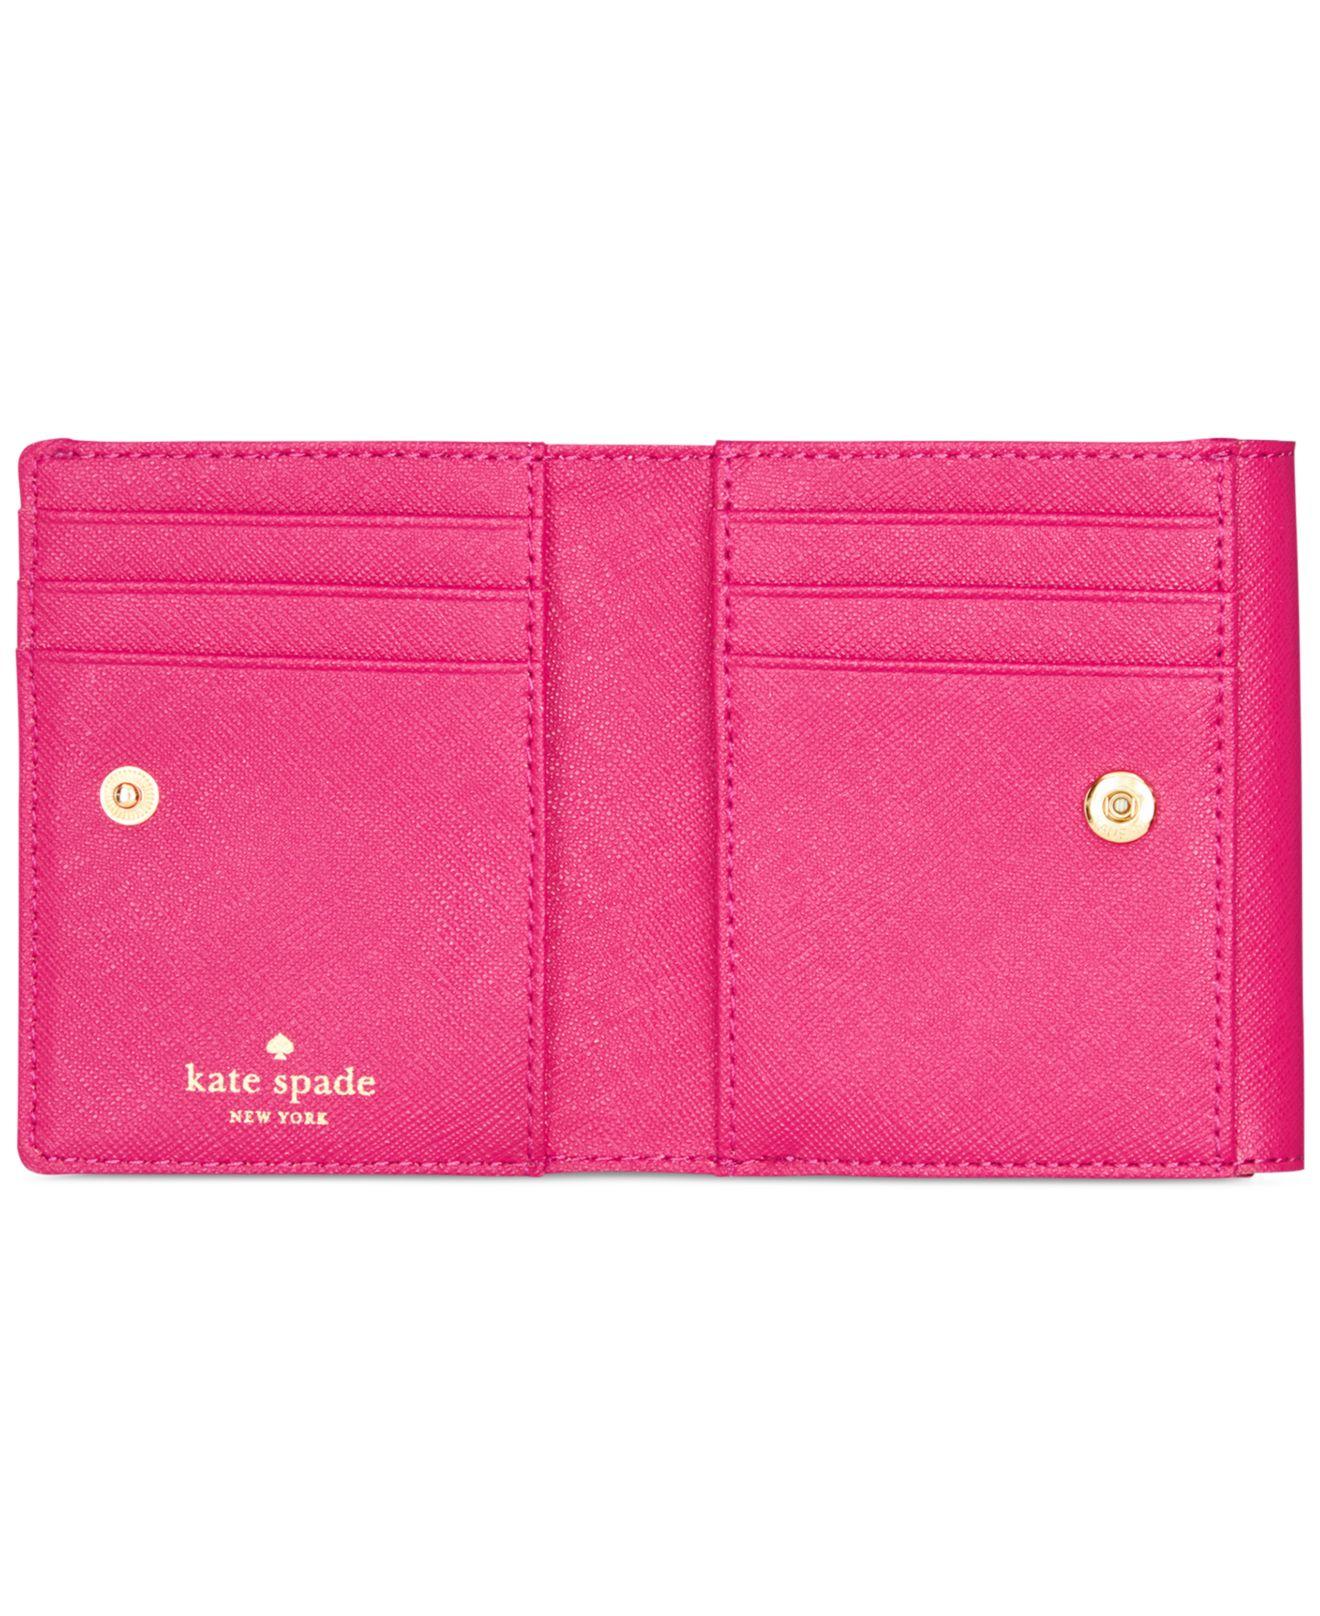 Lyst - Kate Spade New York Cedar Street Tavy Wallet in Pink